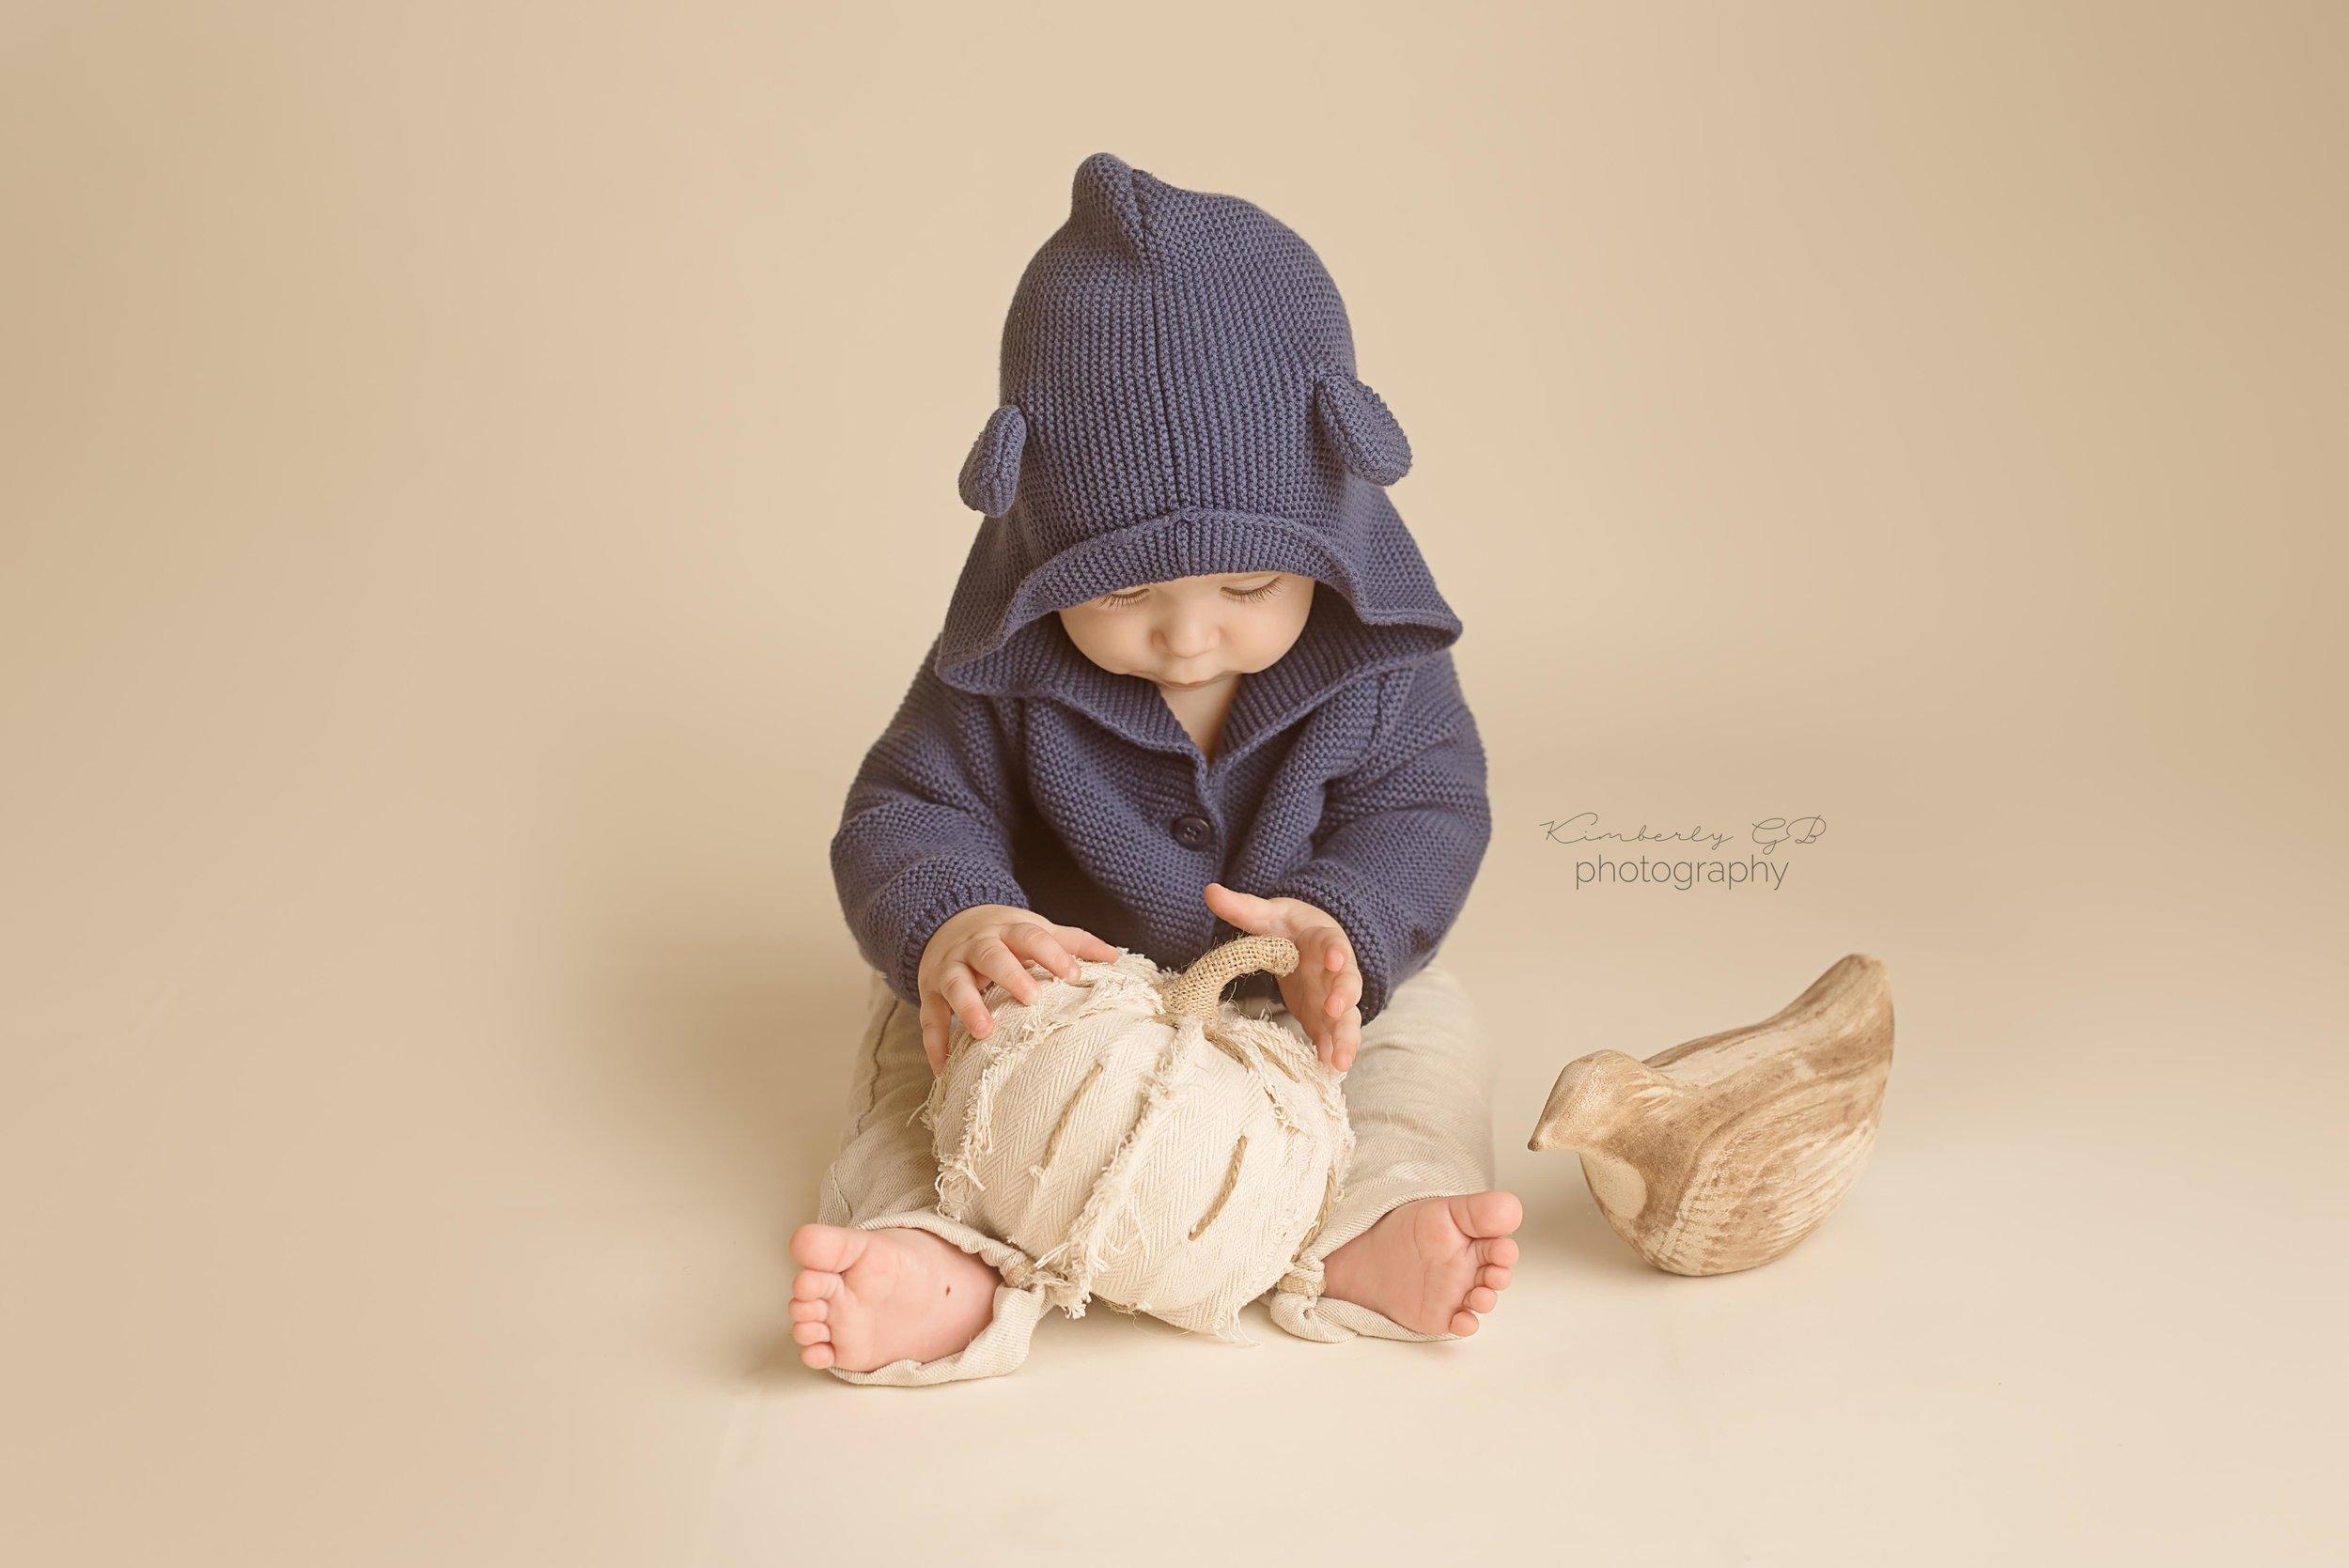 fotografia-de-ninos-bebes-kids-children-en-puerto-rico-kimberly-gb-photography-fotografa-46.jpg